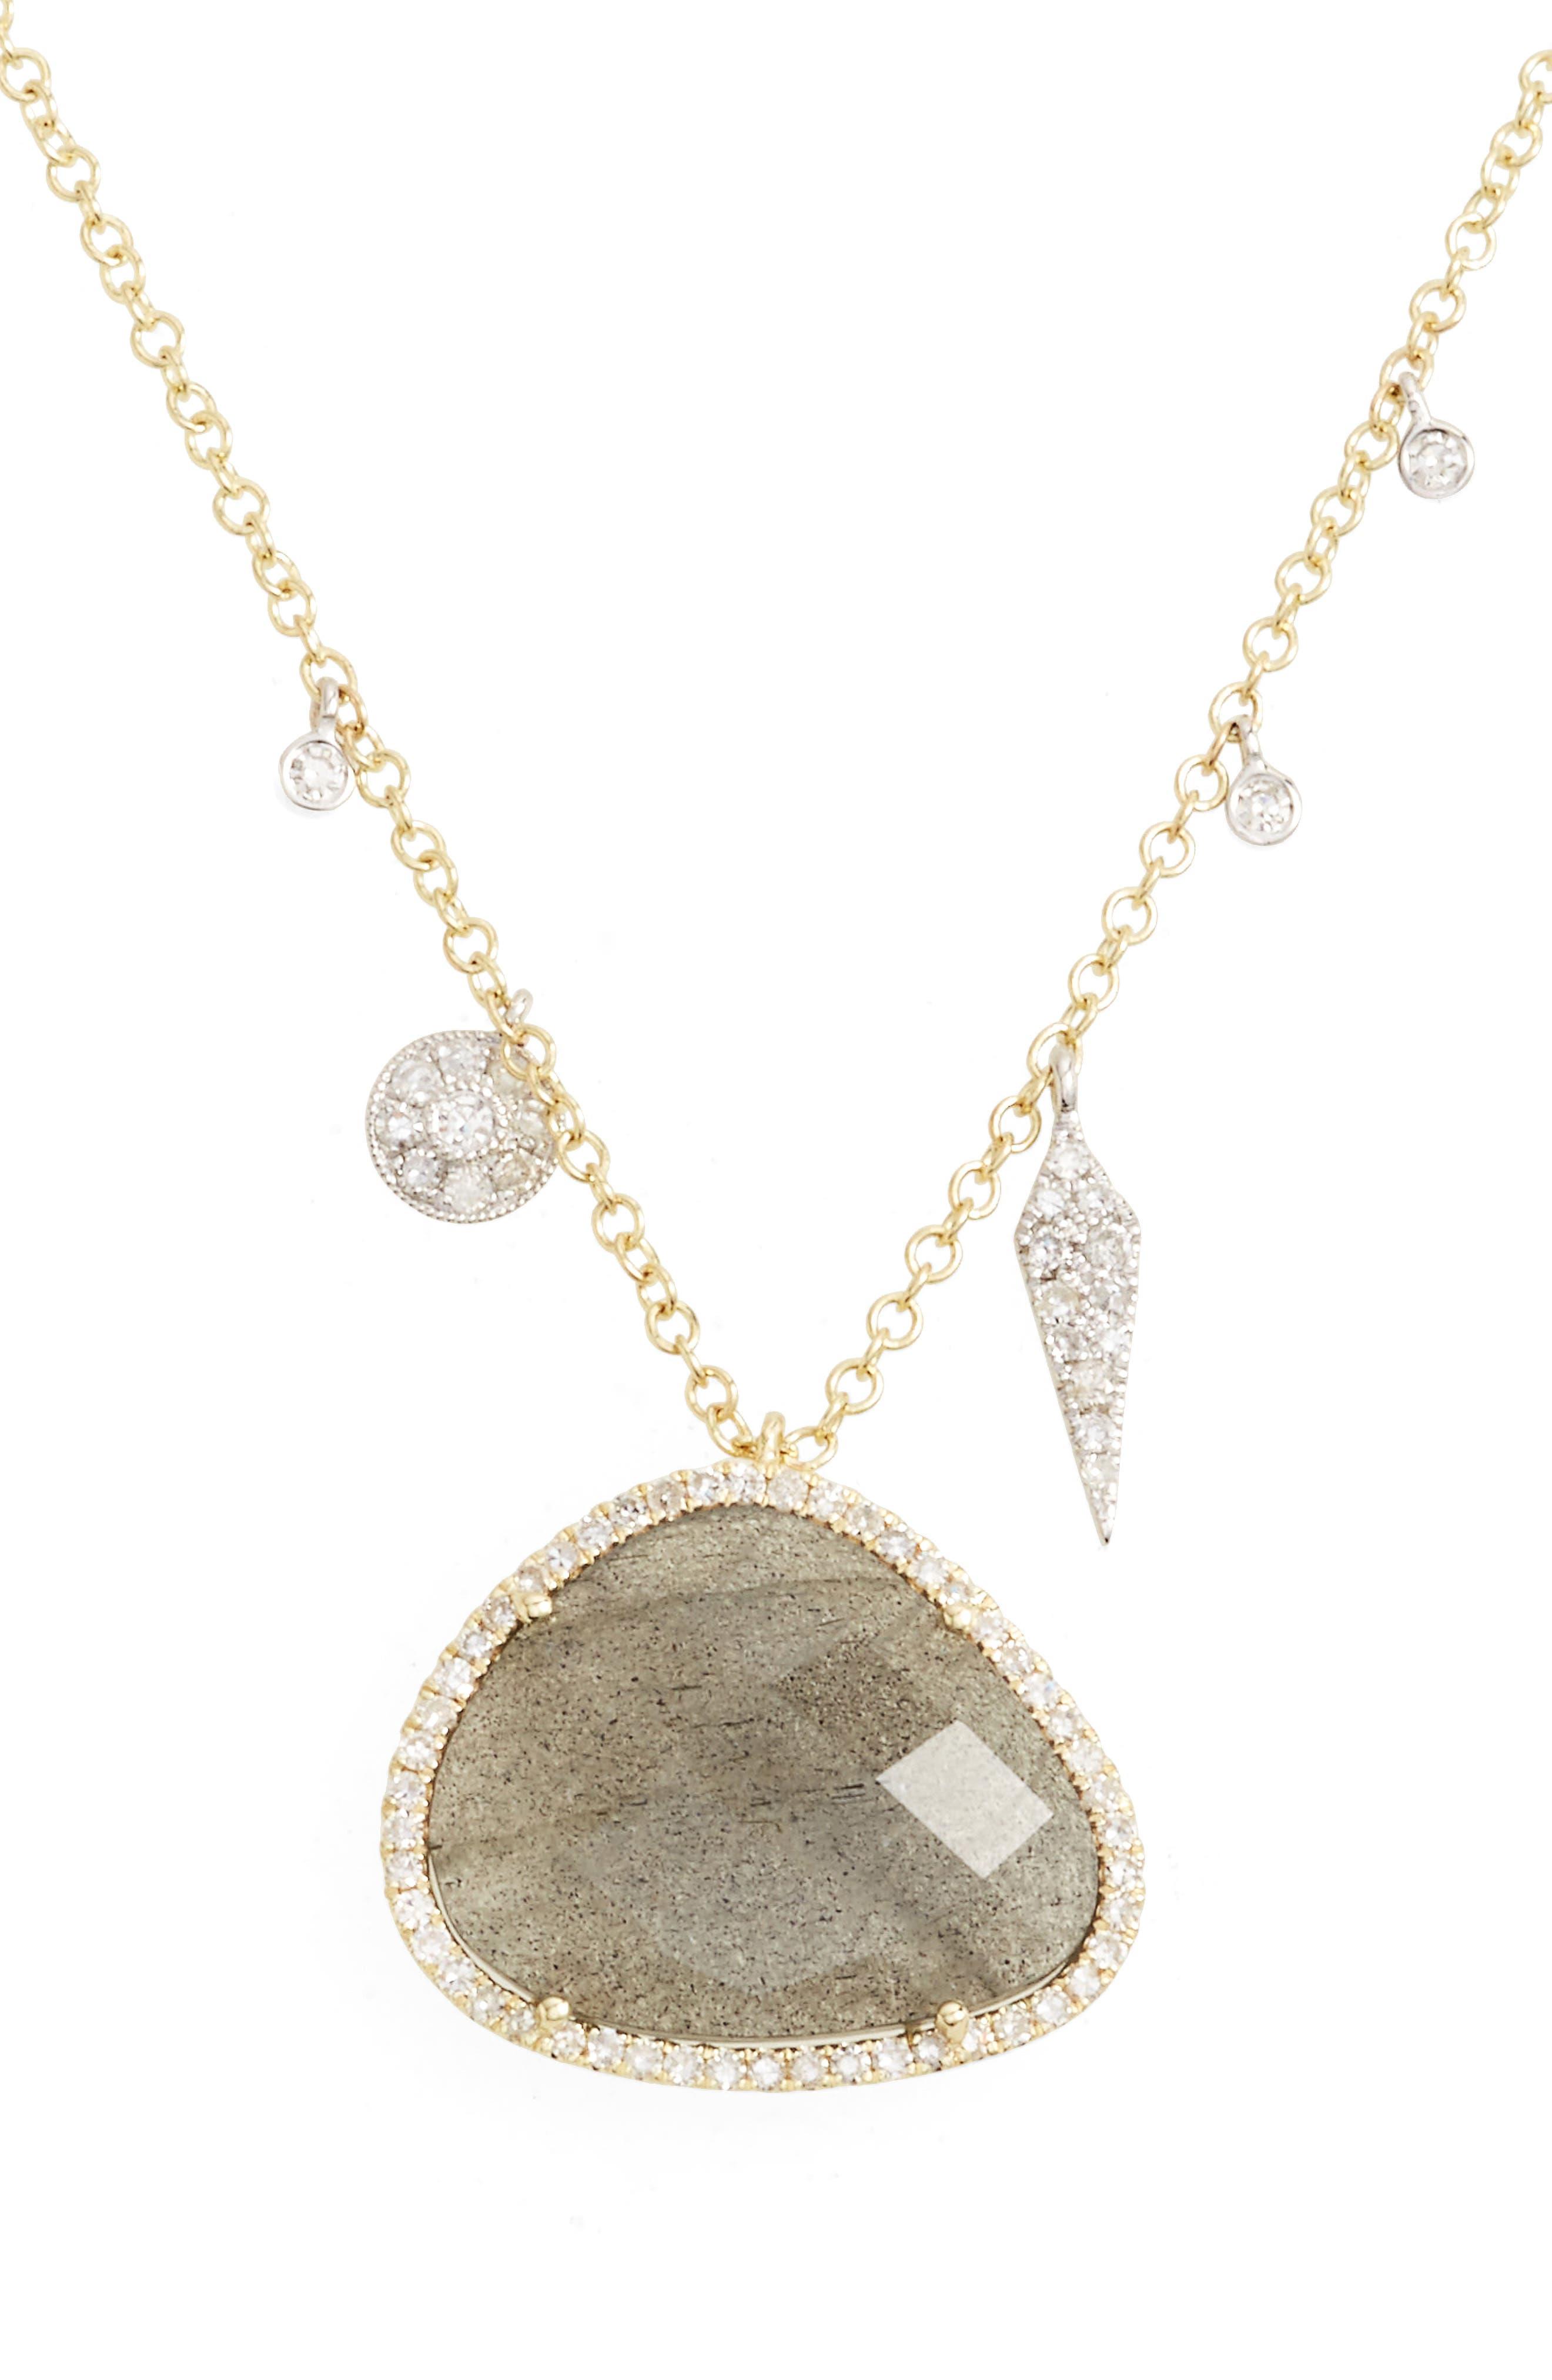 Jewelry Diamond & Semiprecious Stone Pendant Necklace,                             Main thumbnail 1, color,                             710